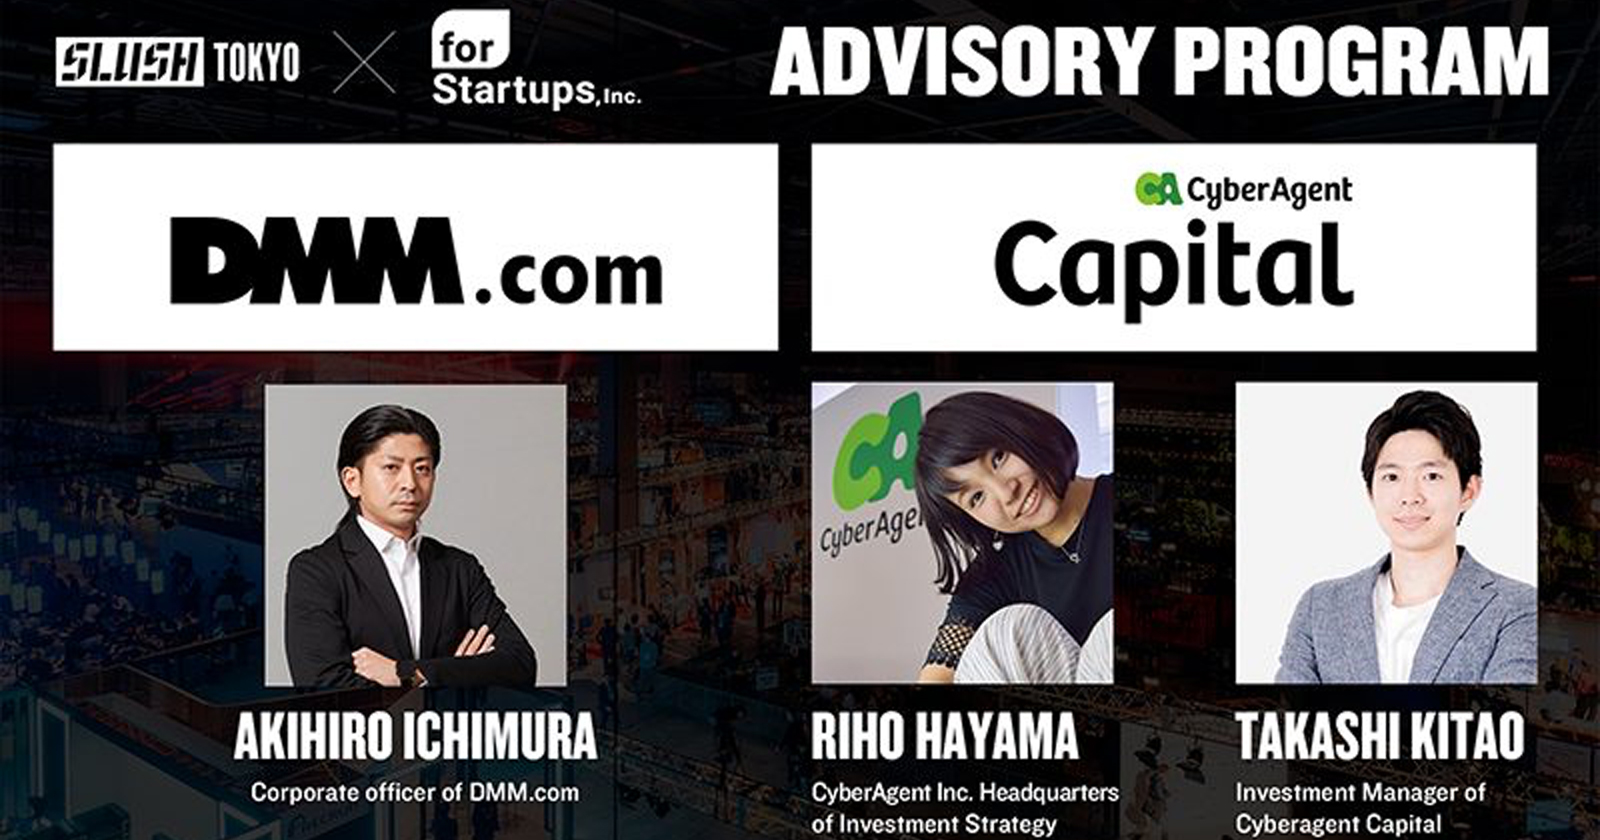 Slush Tokyo 2019 「Advisory Program」に、 DMM VENTURES「100億円ファンド」、CyberAgent「藤田ファンド」 およびCyberAgent Capitalの参加決定!